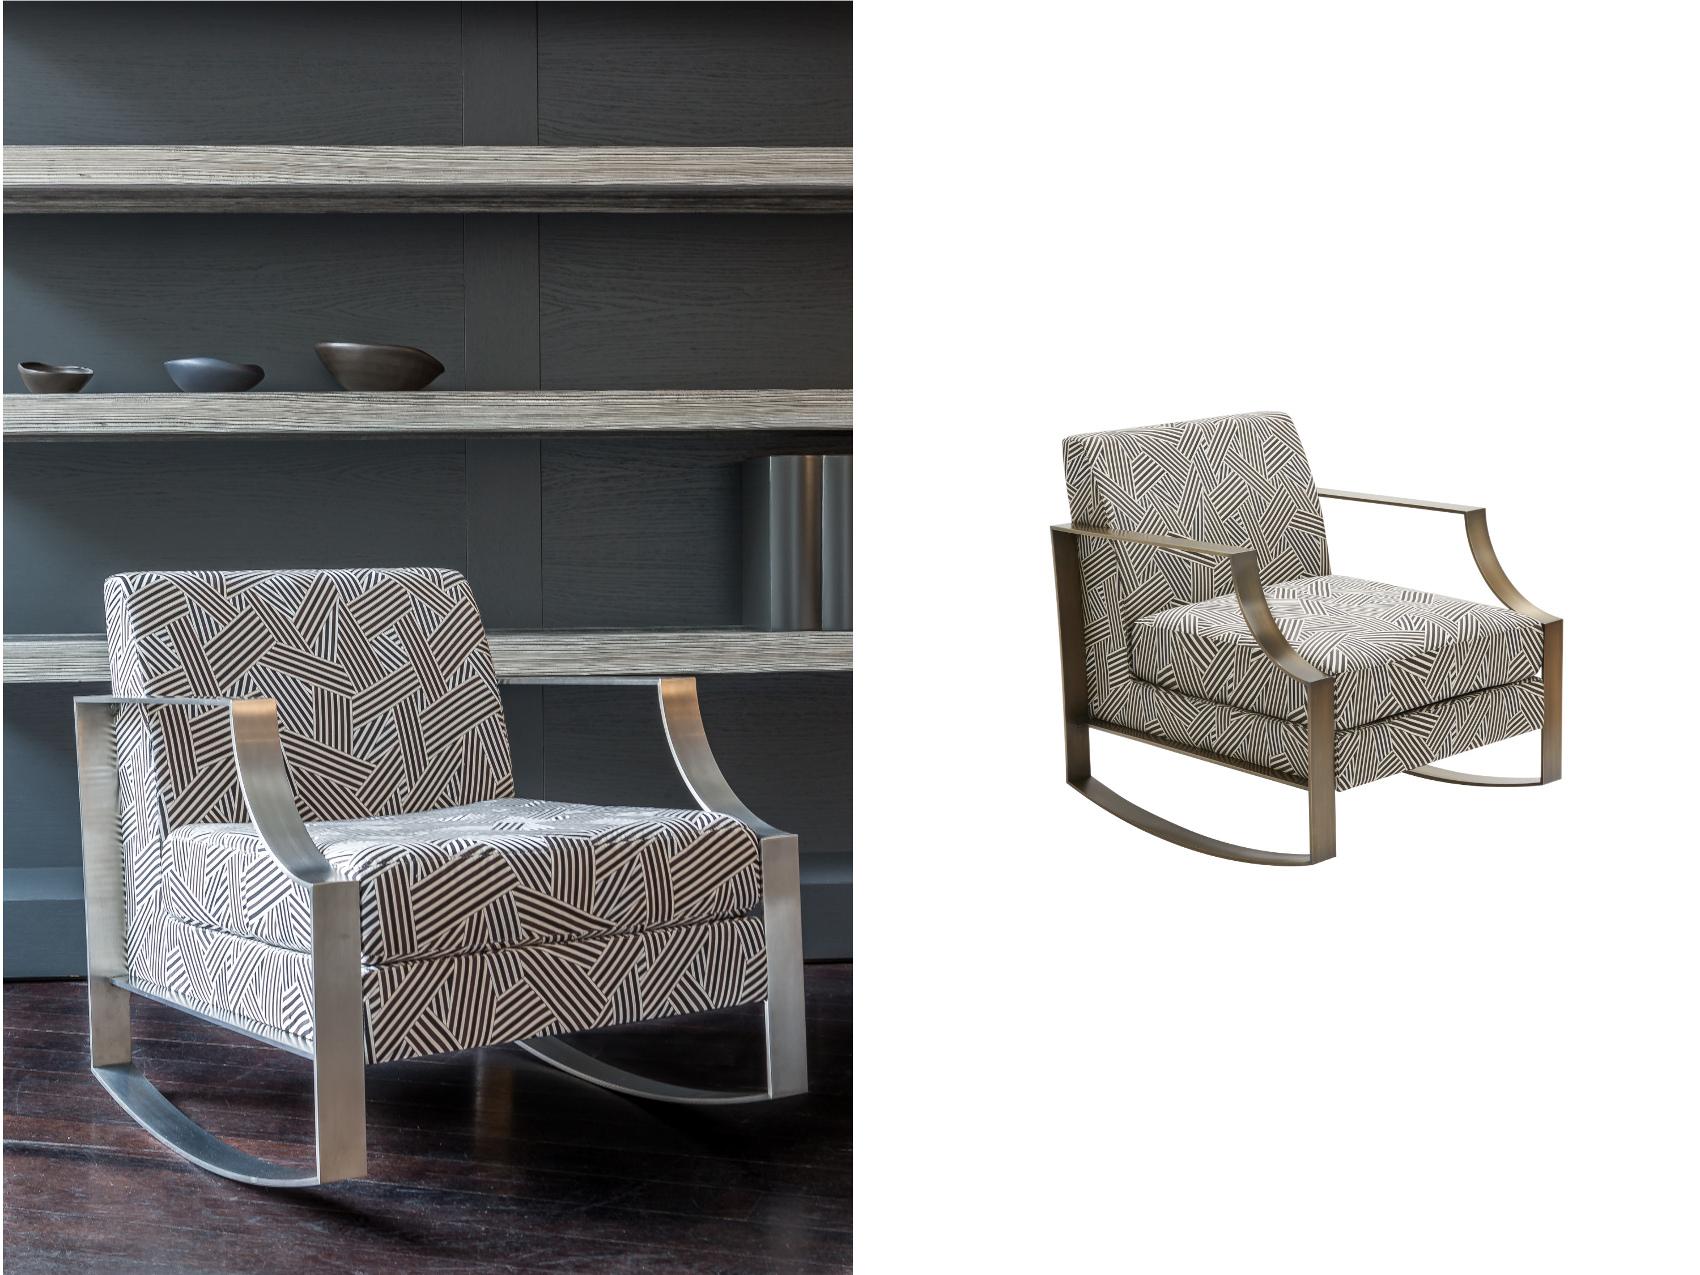 Bertold armchair - Philippe Hurel